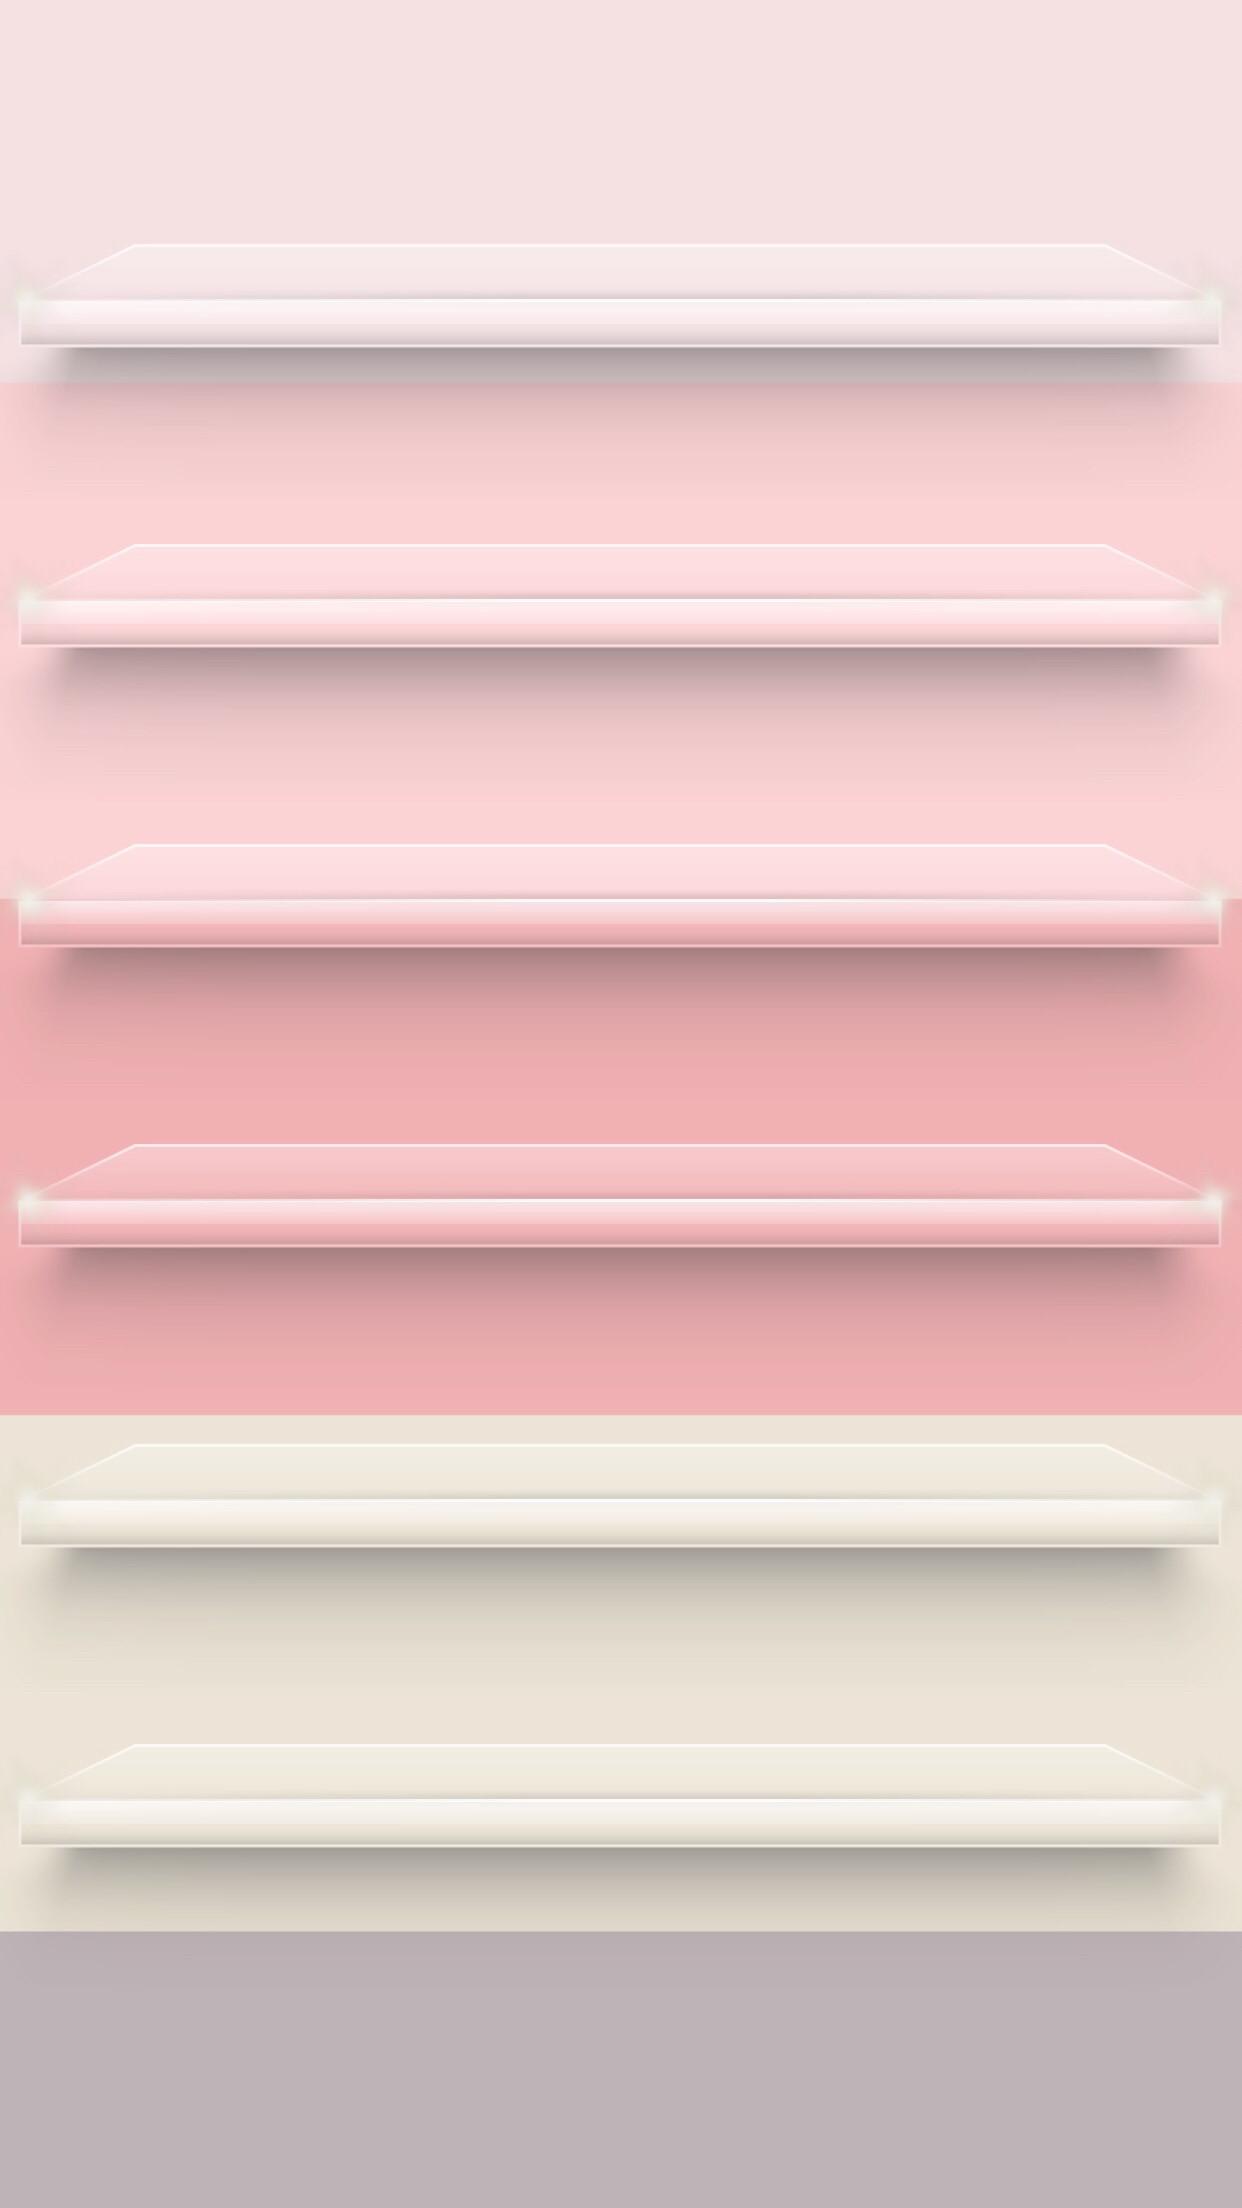 Most Inspiring Wallpaper Home Screen Aesthetic - 288880  Snapshot_95839.jpg